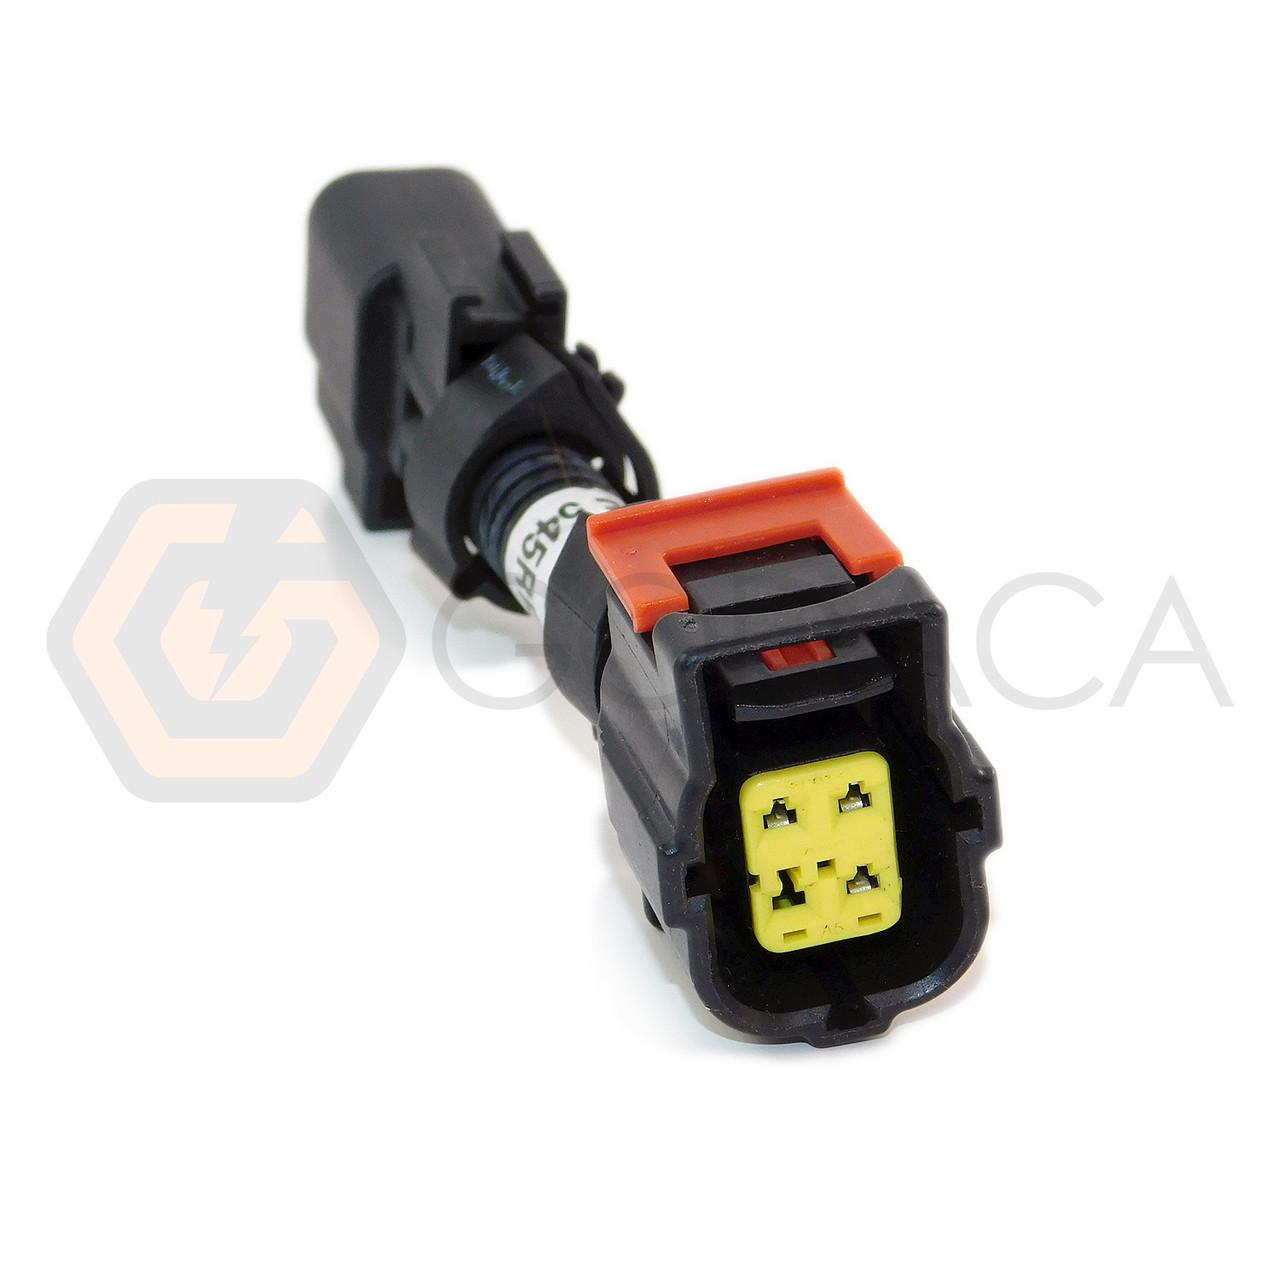 1x wiring harness for dodge chrysler transmission line pressure booster 45rfe godaca llc  [ 1280 x 1280 Pixel ]